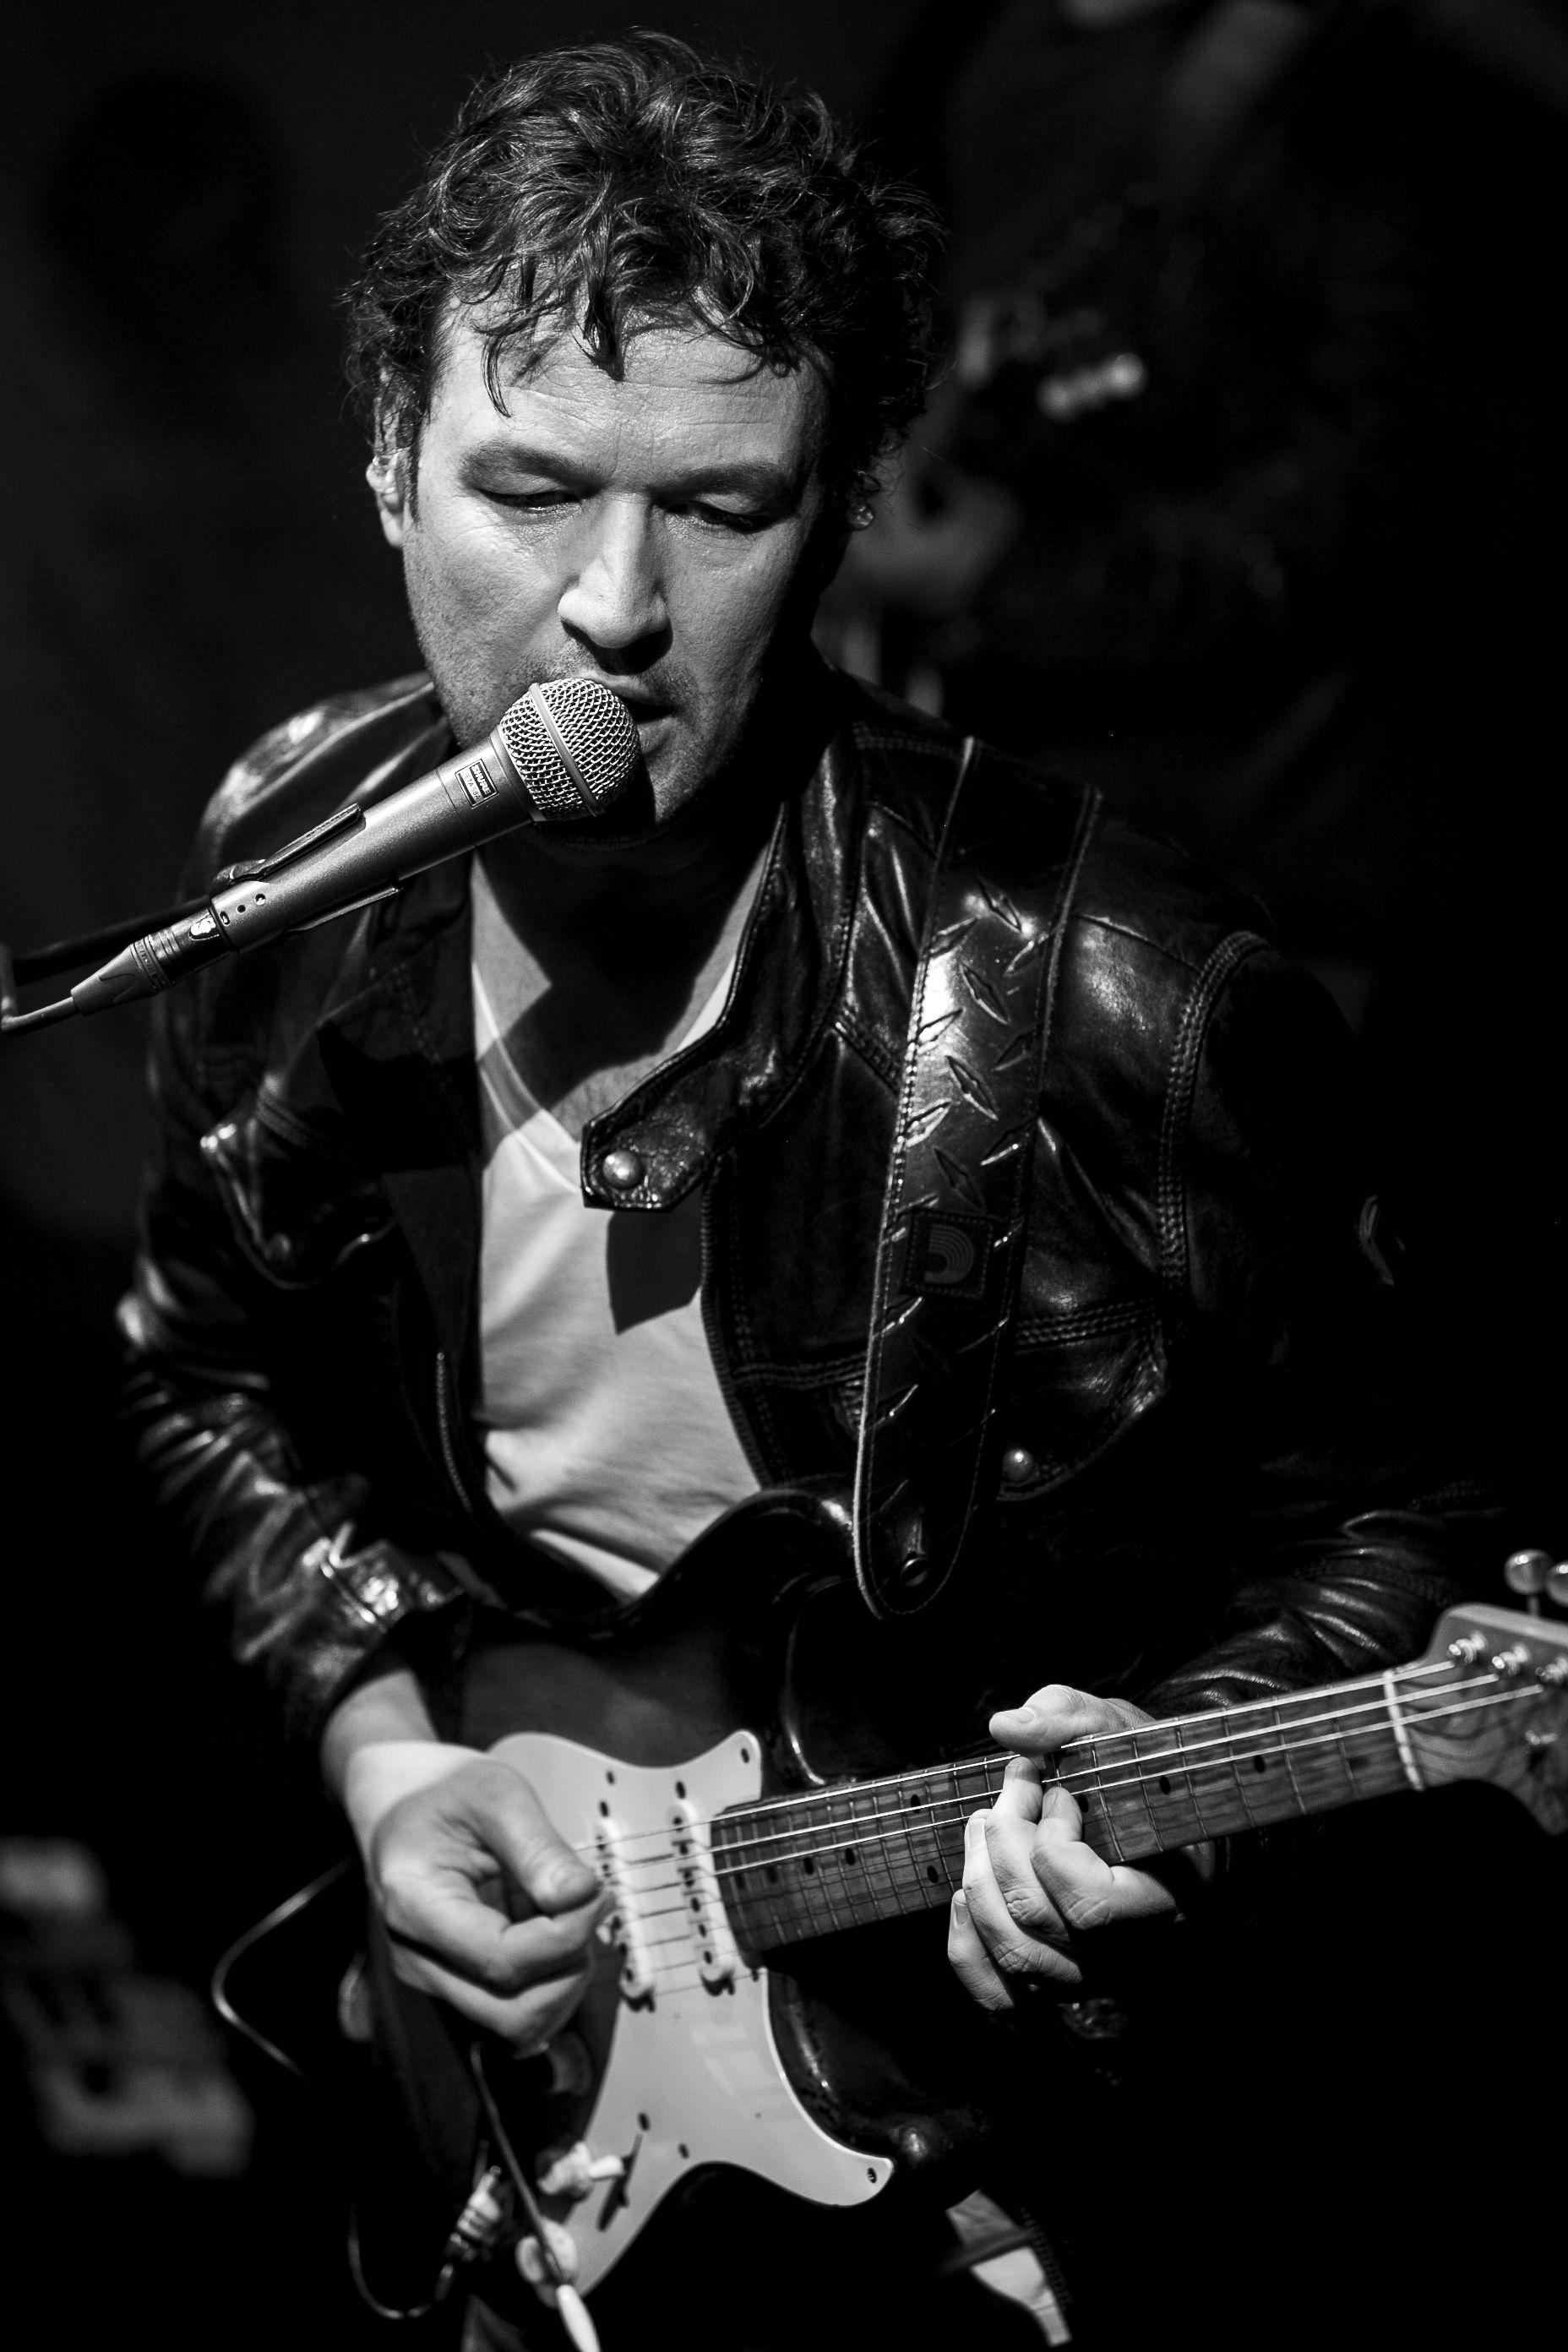 #jeanpierredanel #danel #guitar #guitarist #strat #fender #stratocaster #missdaisy #music #France #rock #live #concert